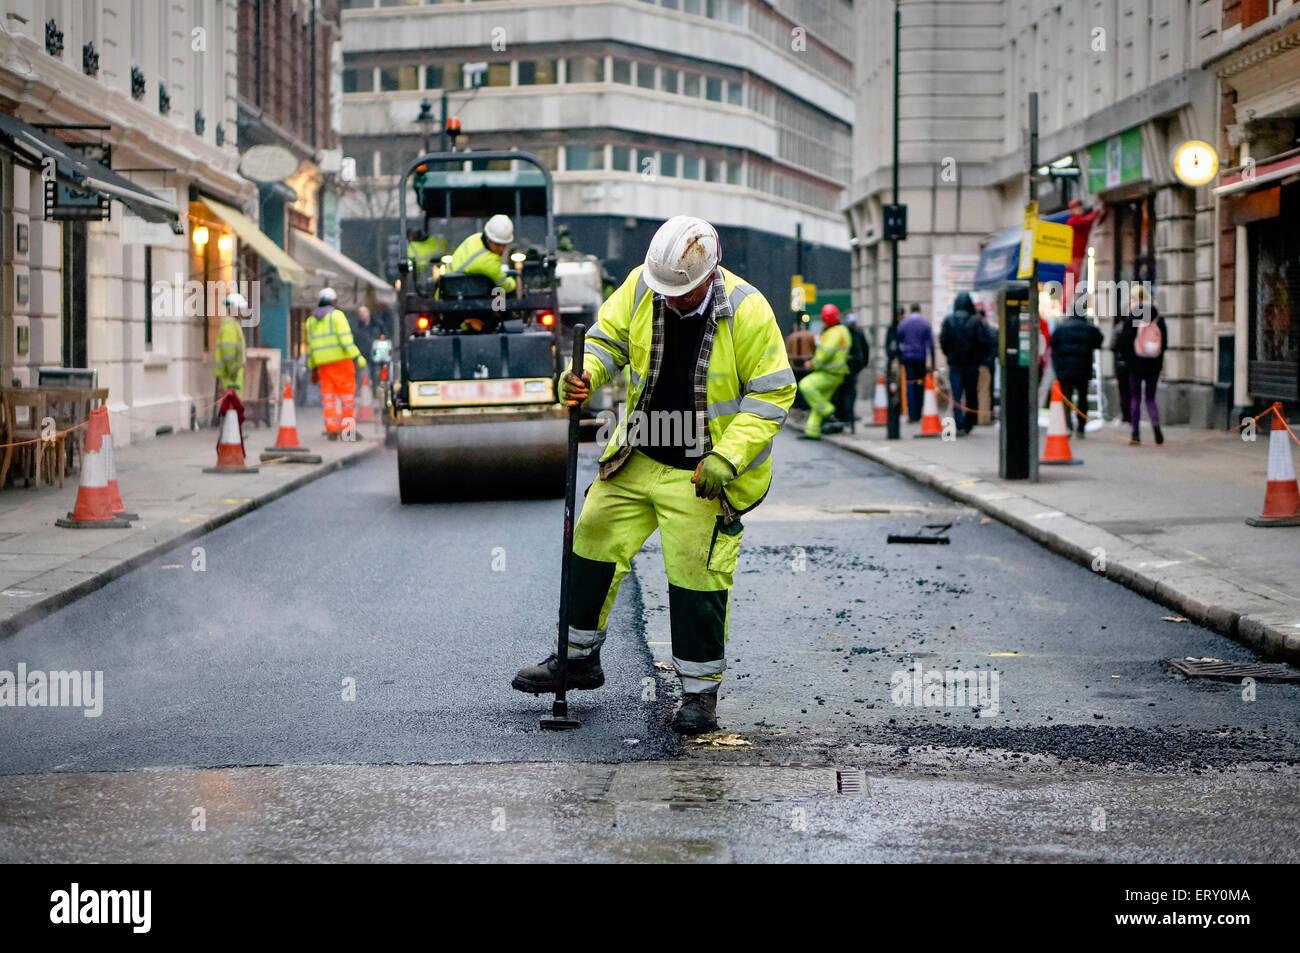 Road crew in London - Stock Image